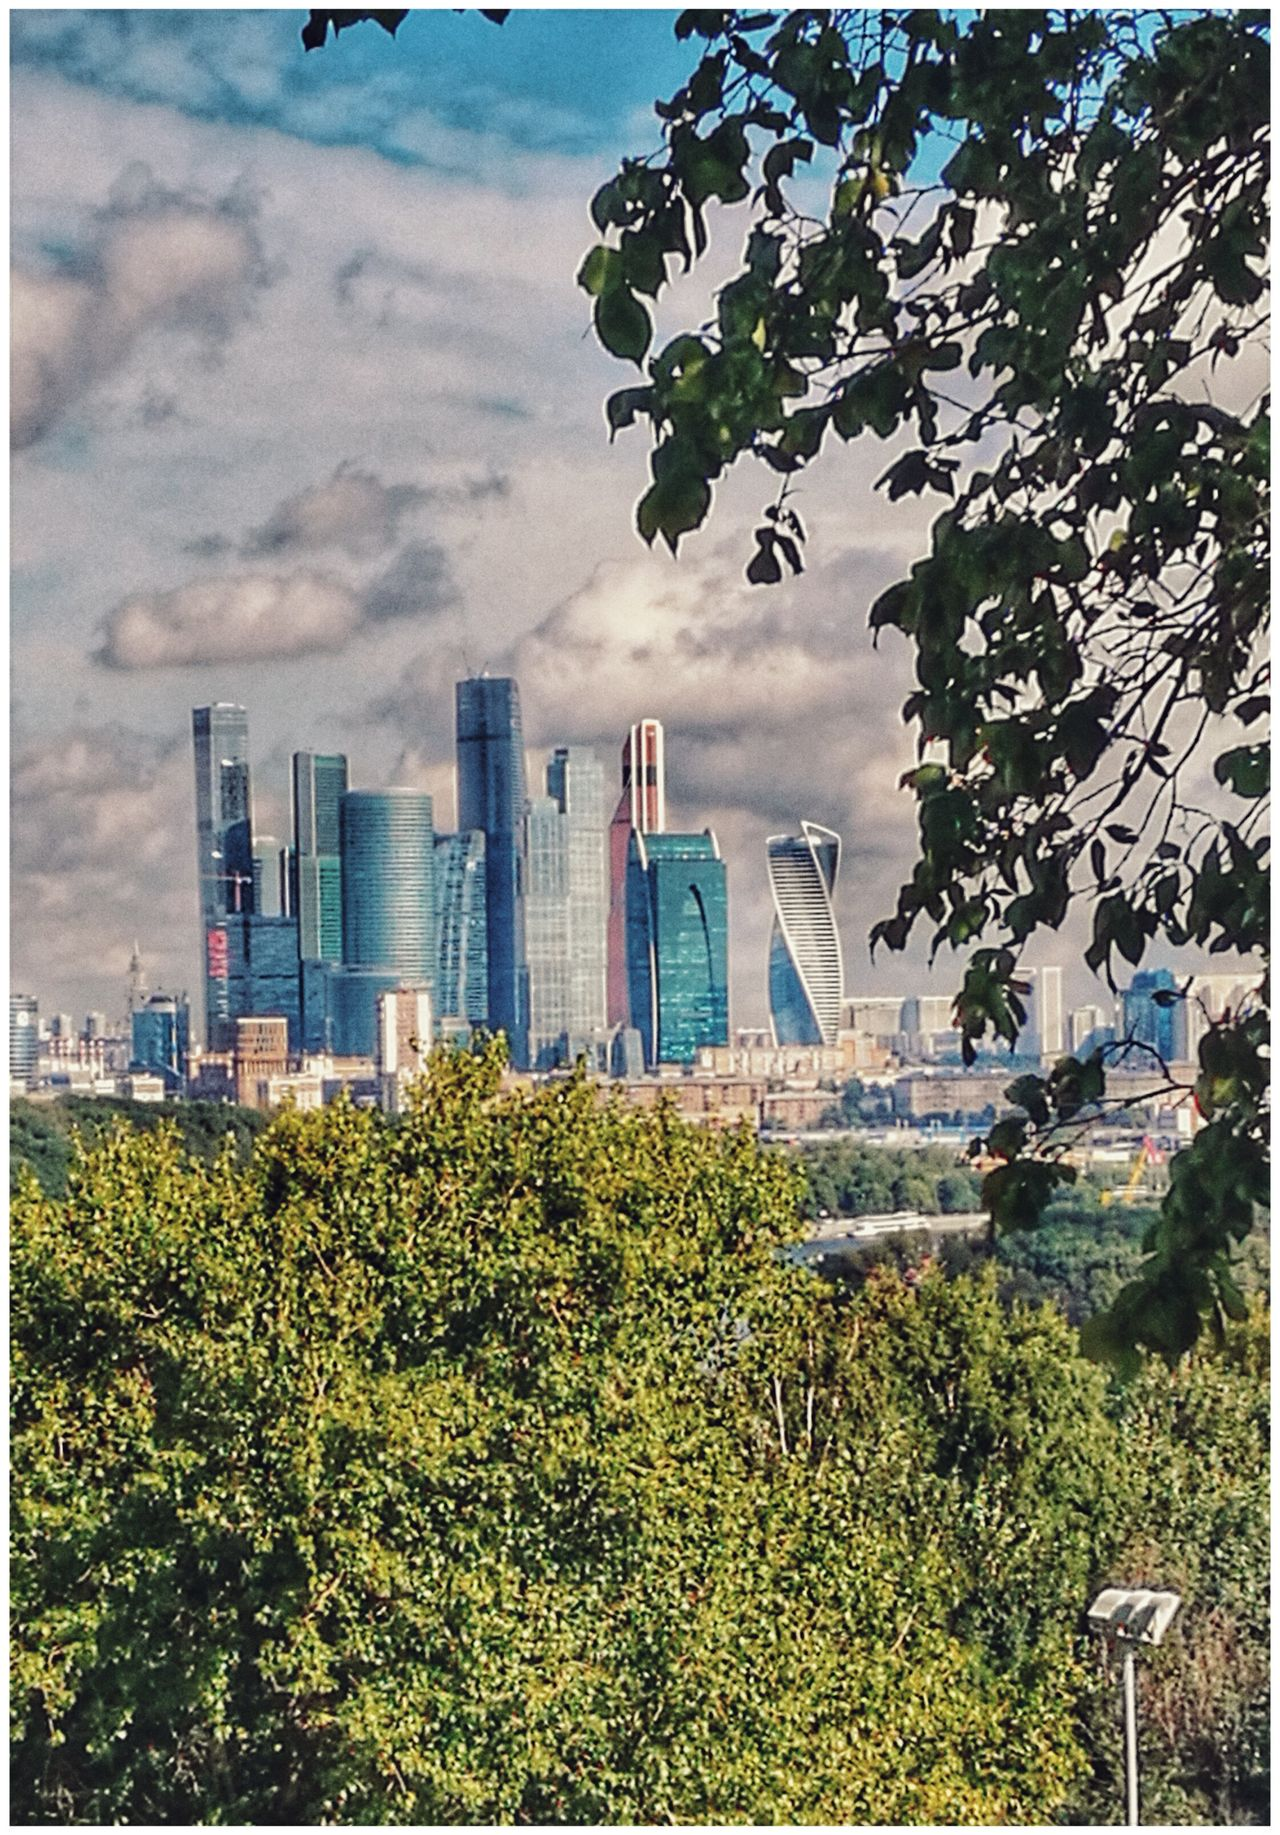 Collina Dei Passeri Moscow Panorama Panoramashot Panoramic Panoramic Photography Panoramic View Vacation Destination Vacation Time